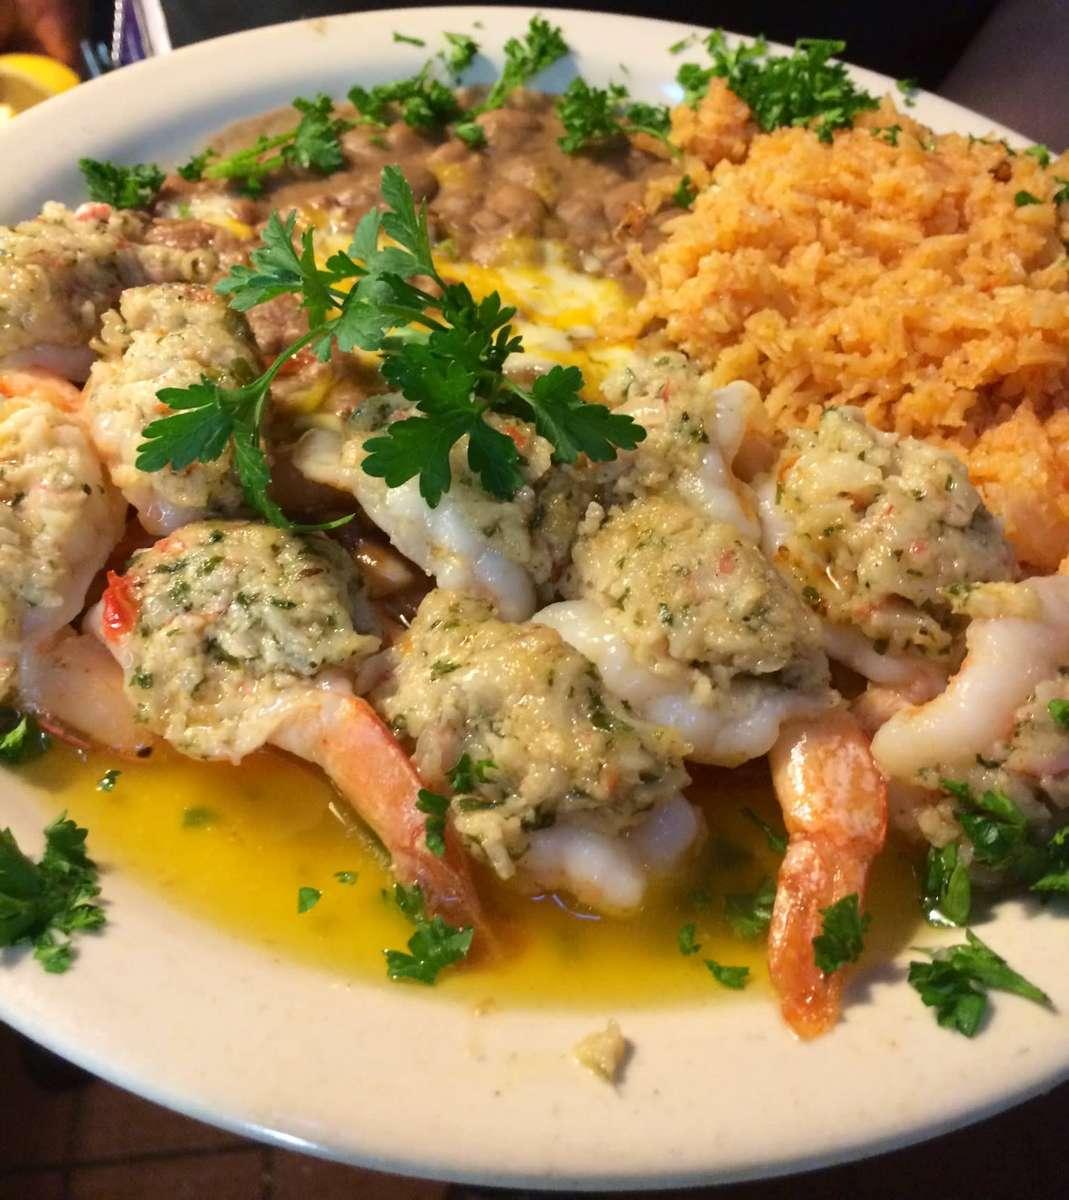 Shrimp Stuffed with Crab